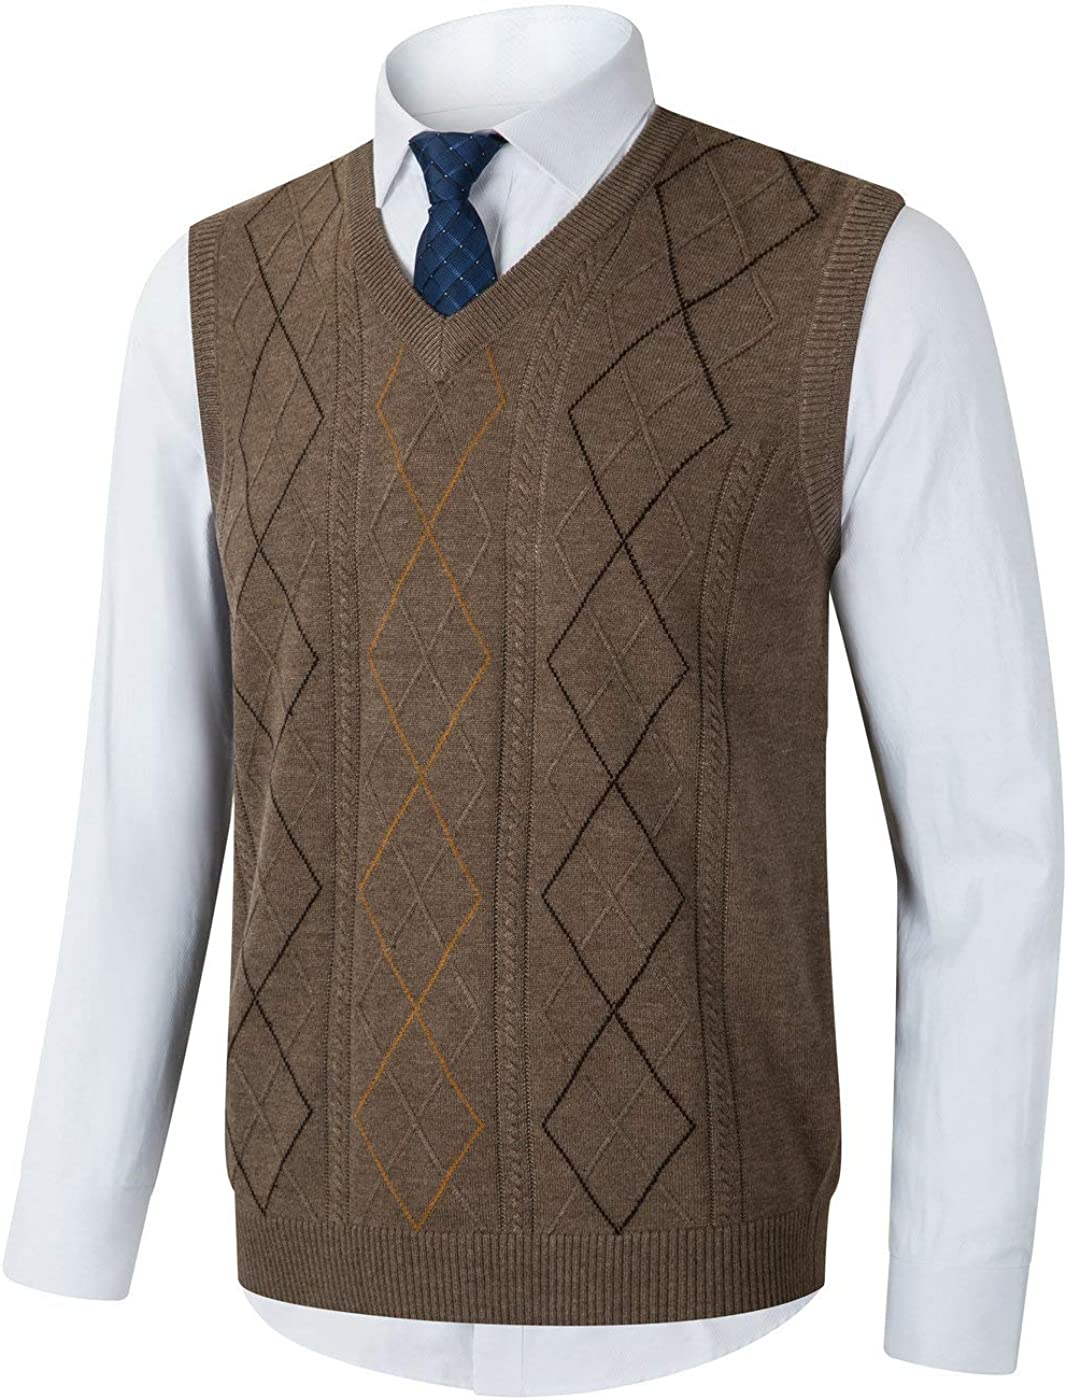 Hand knit vest Mens tank top with geometric jacquard